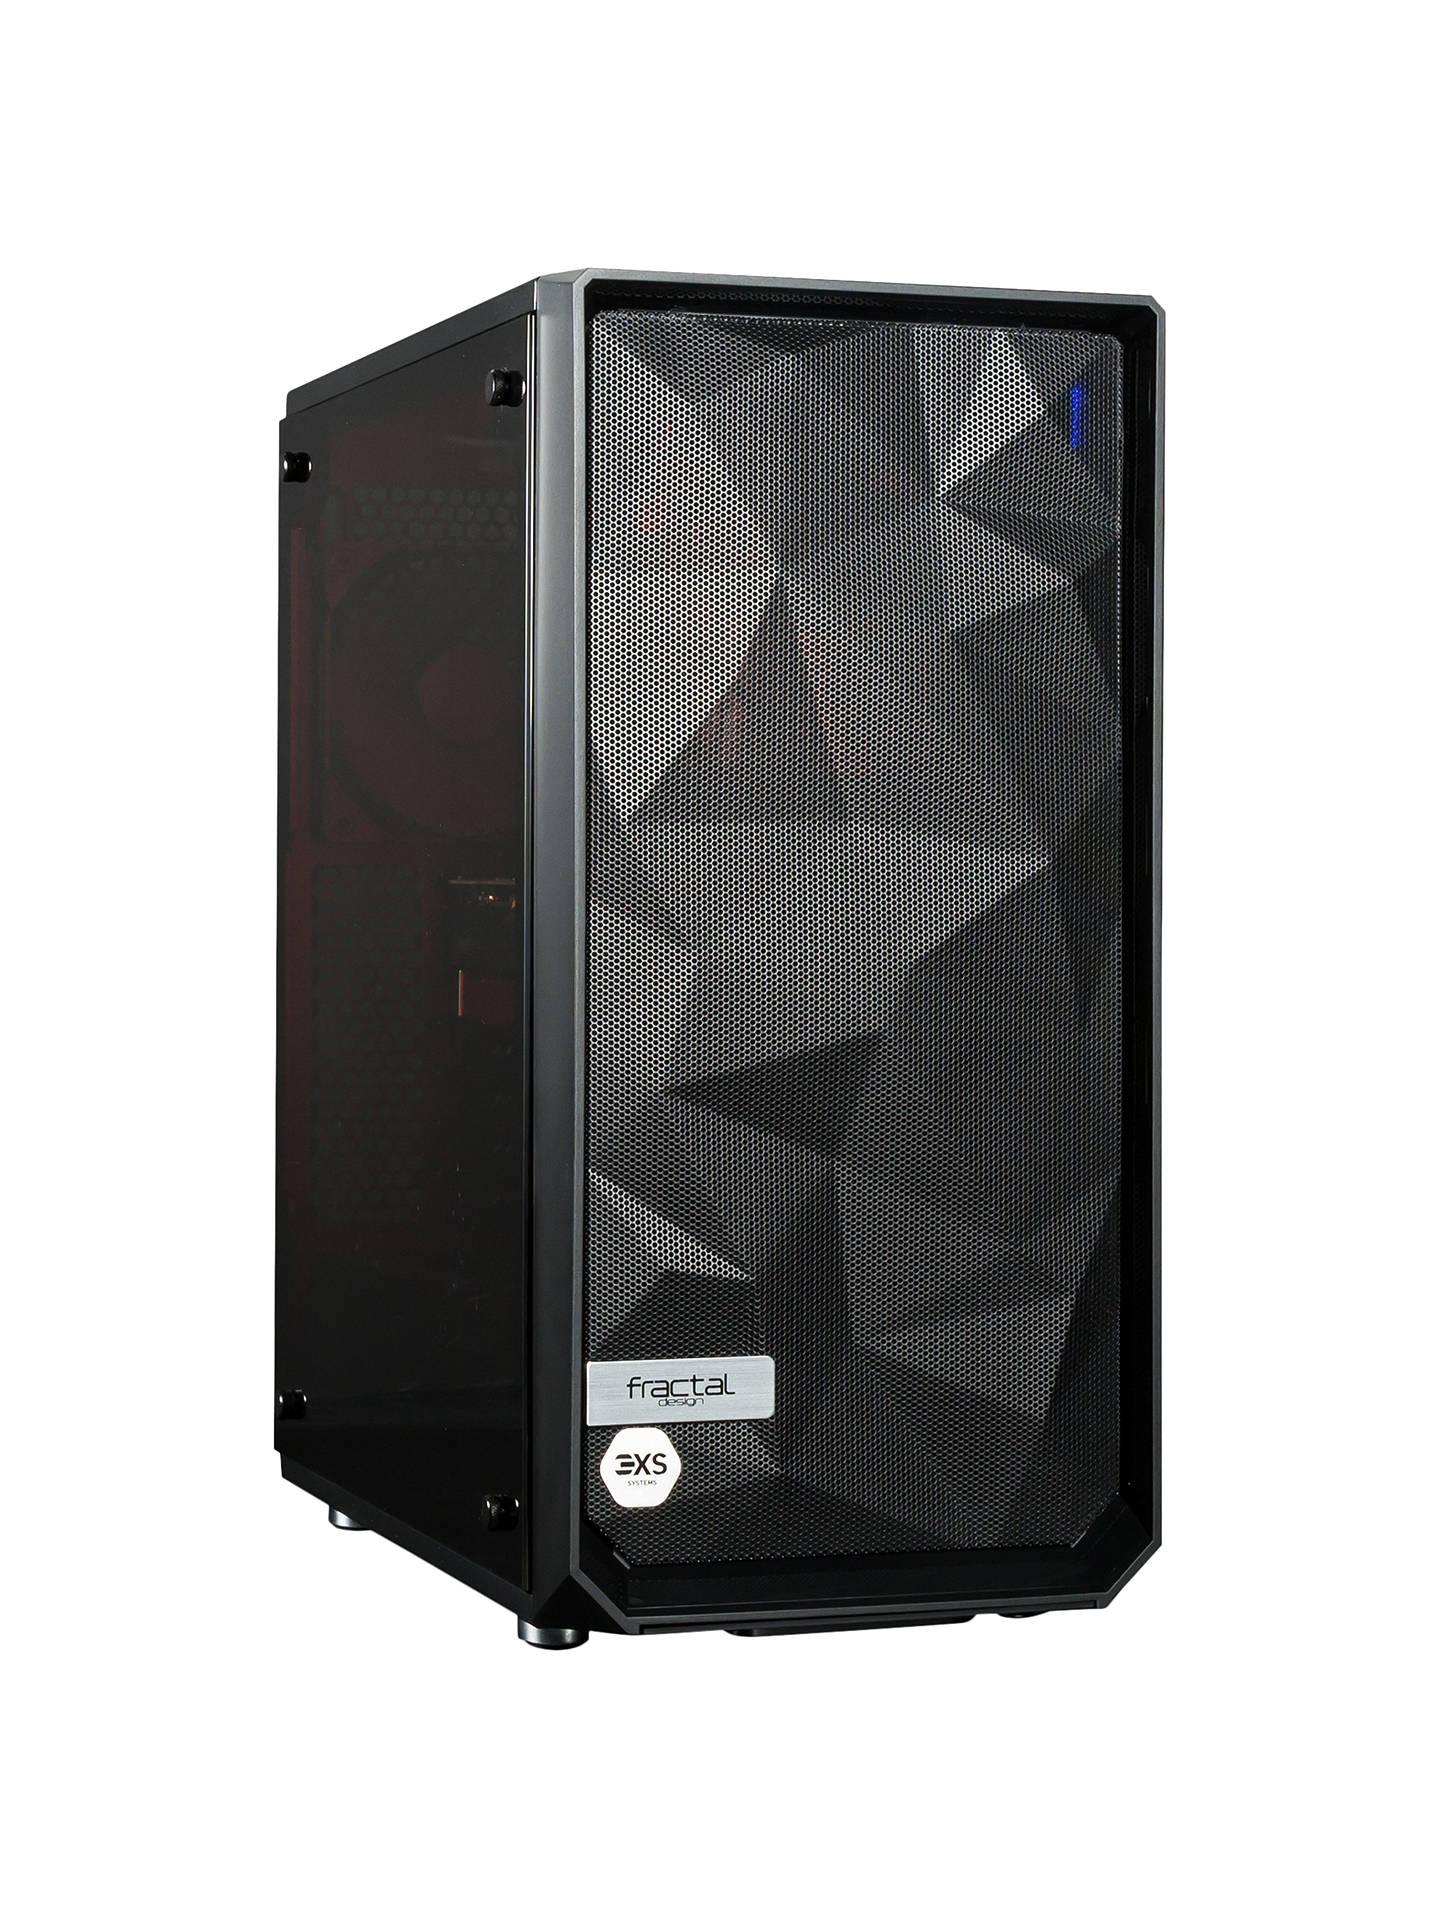 Scan 3XS LN85698 Gaming PC, Intel Core i5, 16GB RAM, 2TB HDD